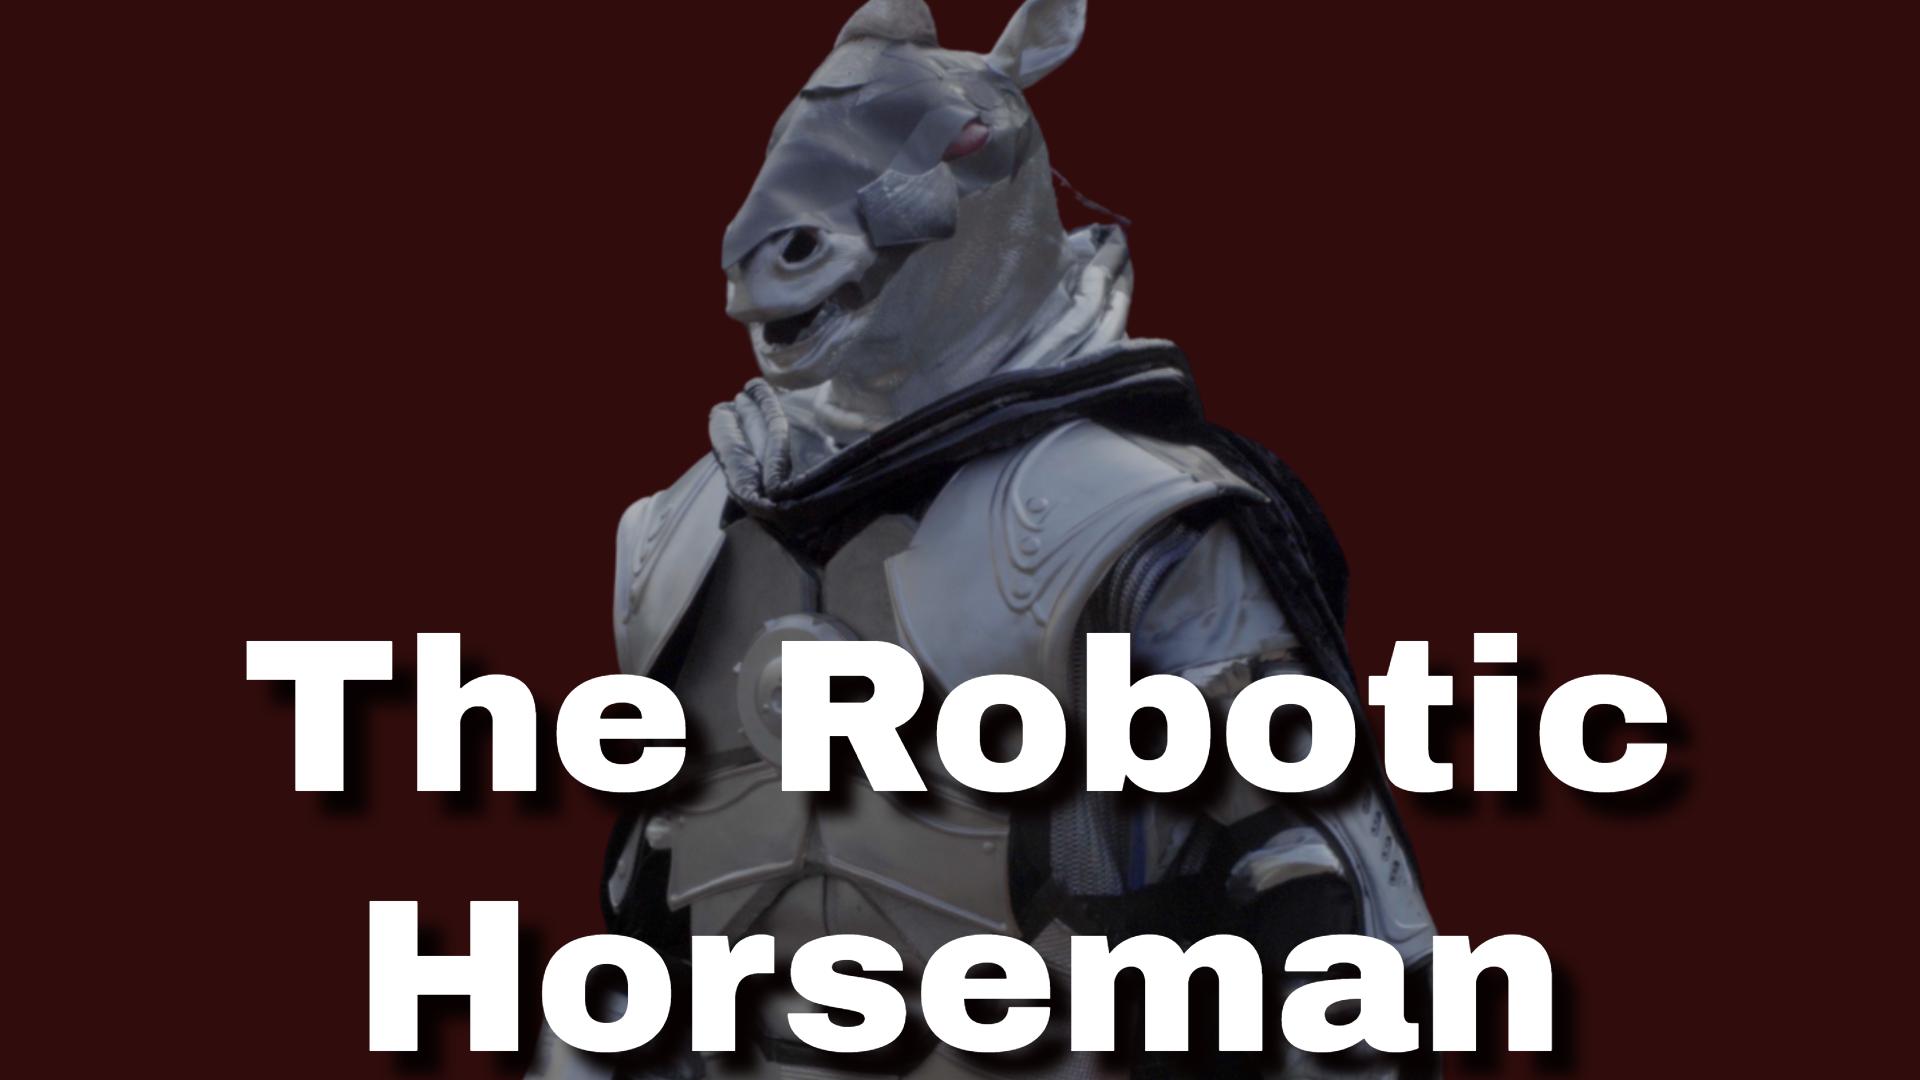 The Robotic Horseman